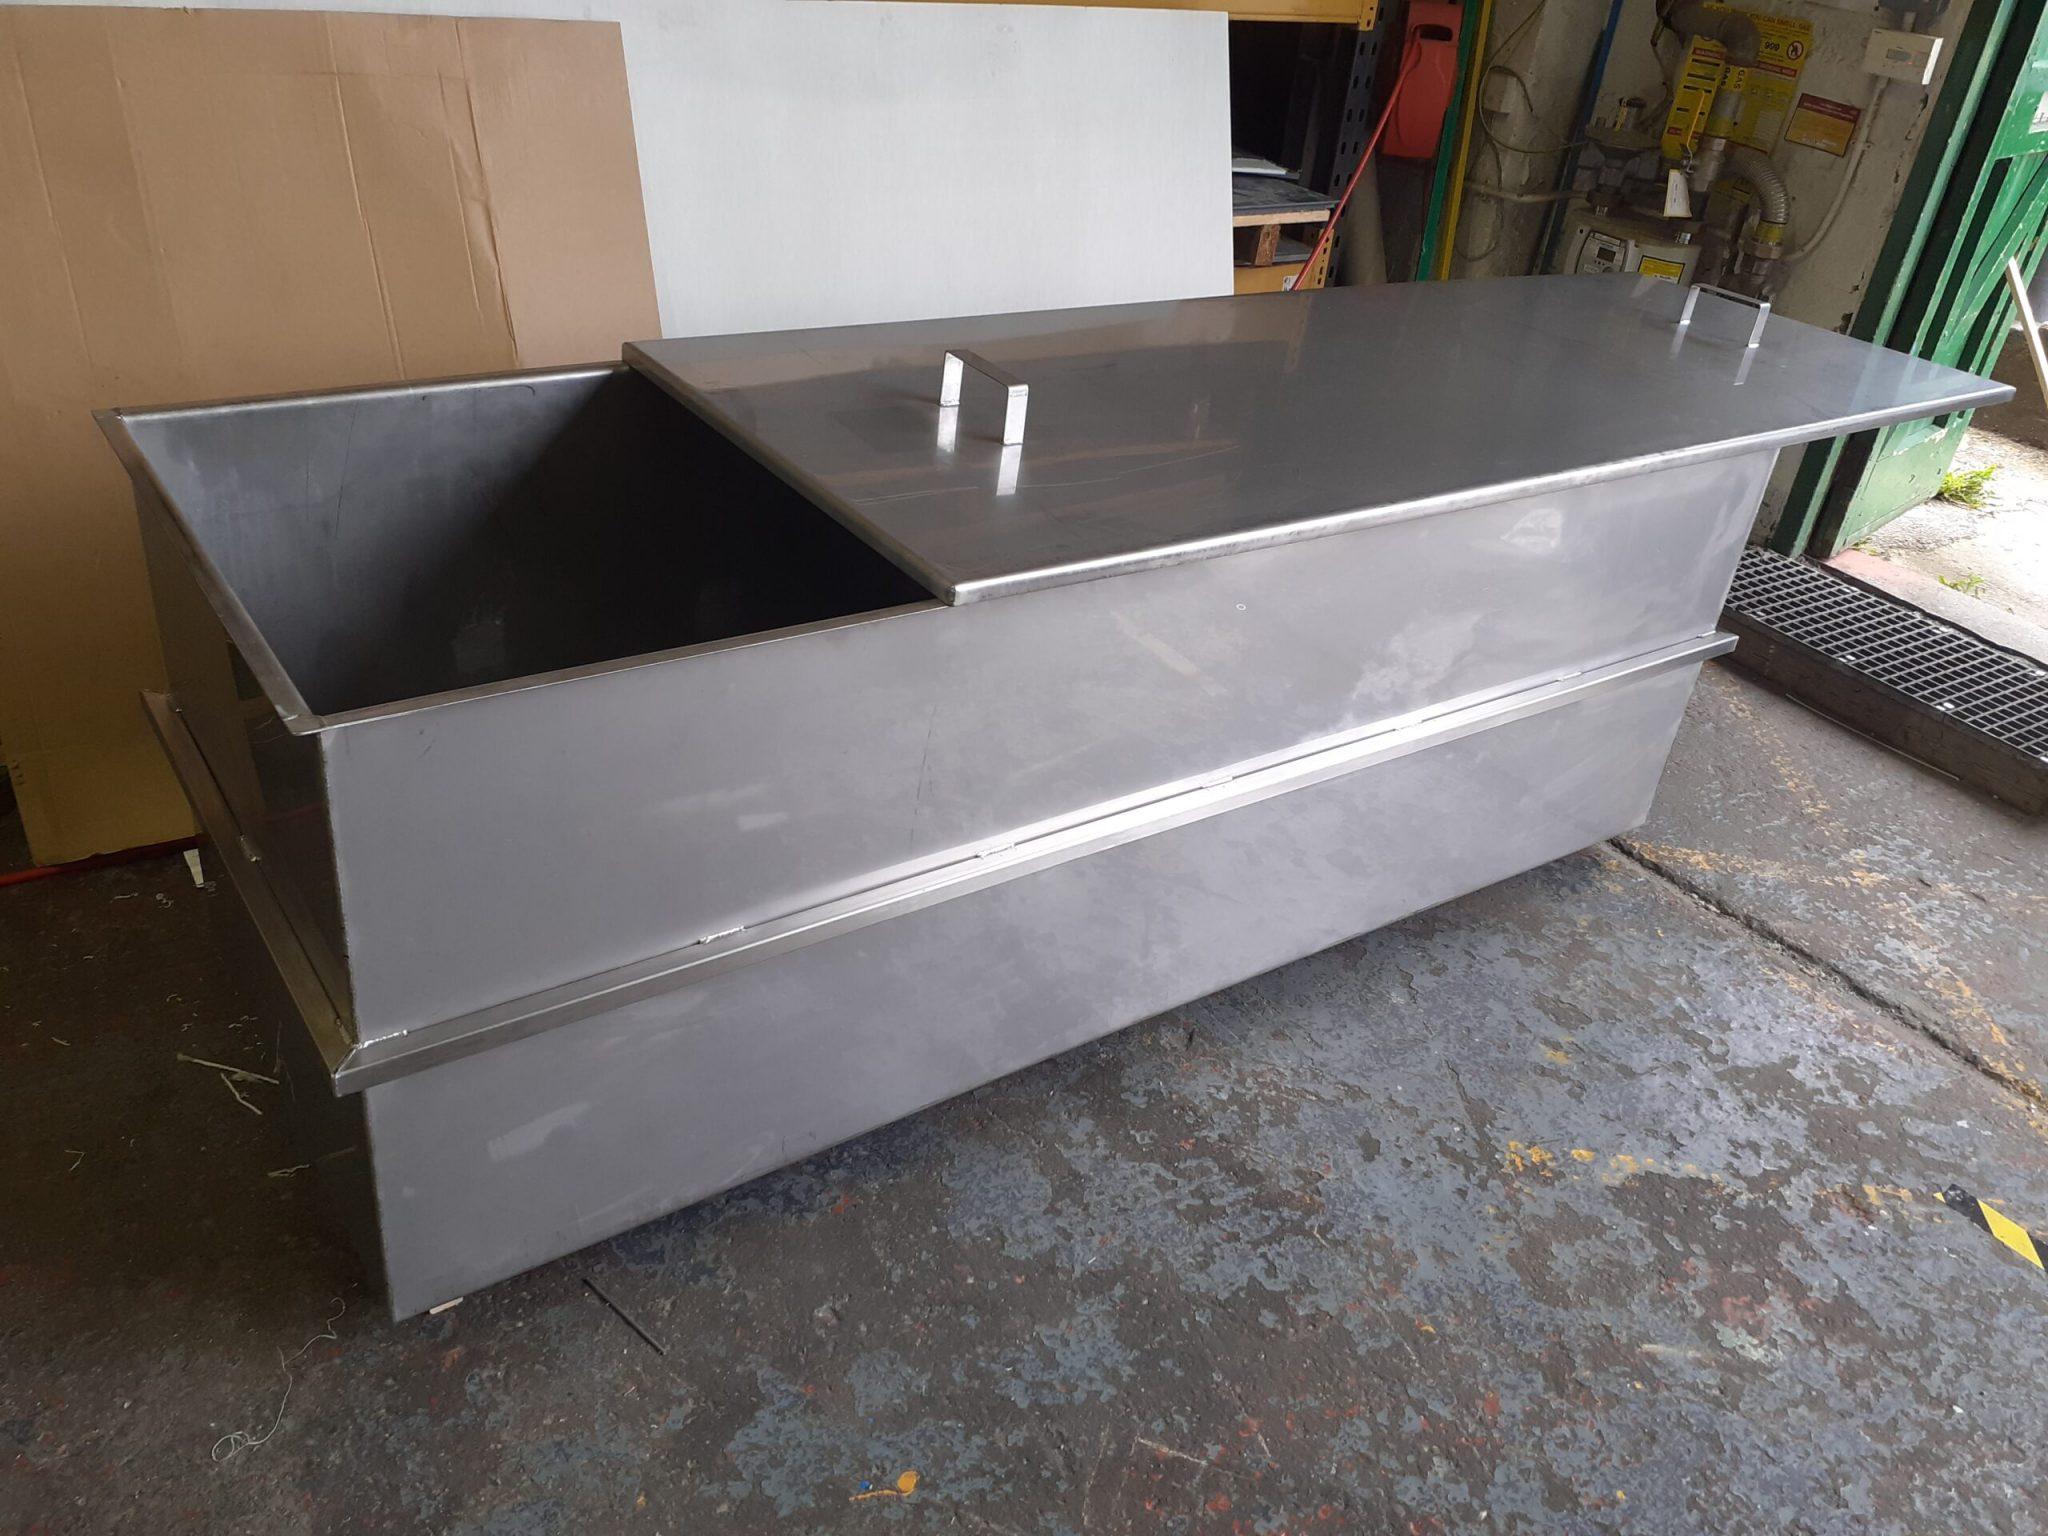 Metallic storage tank